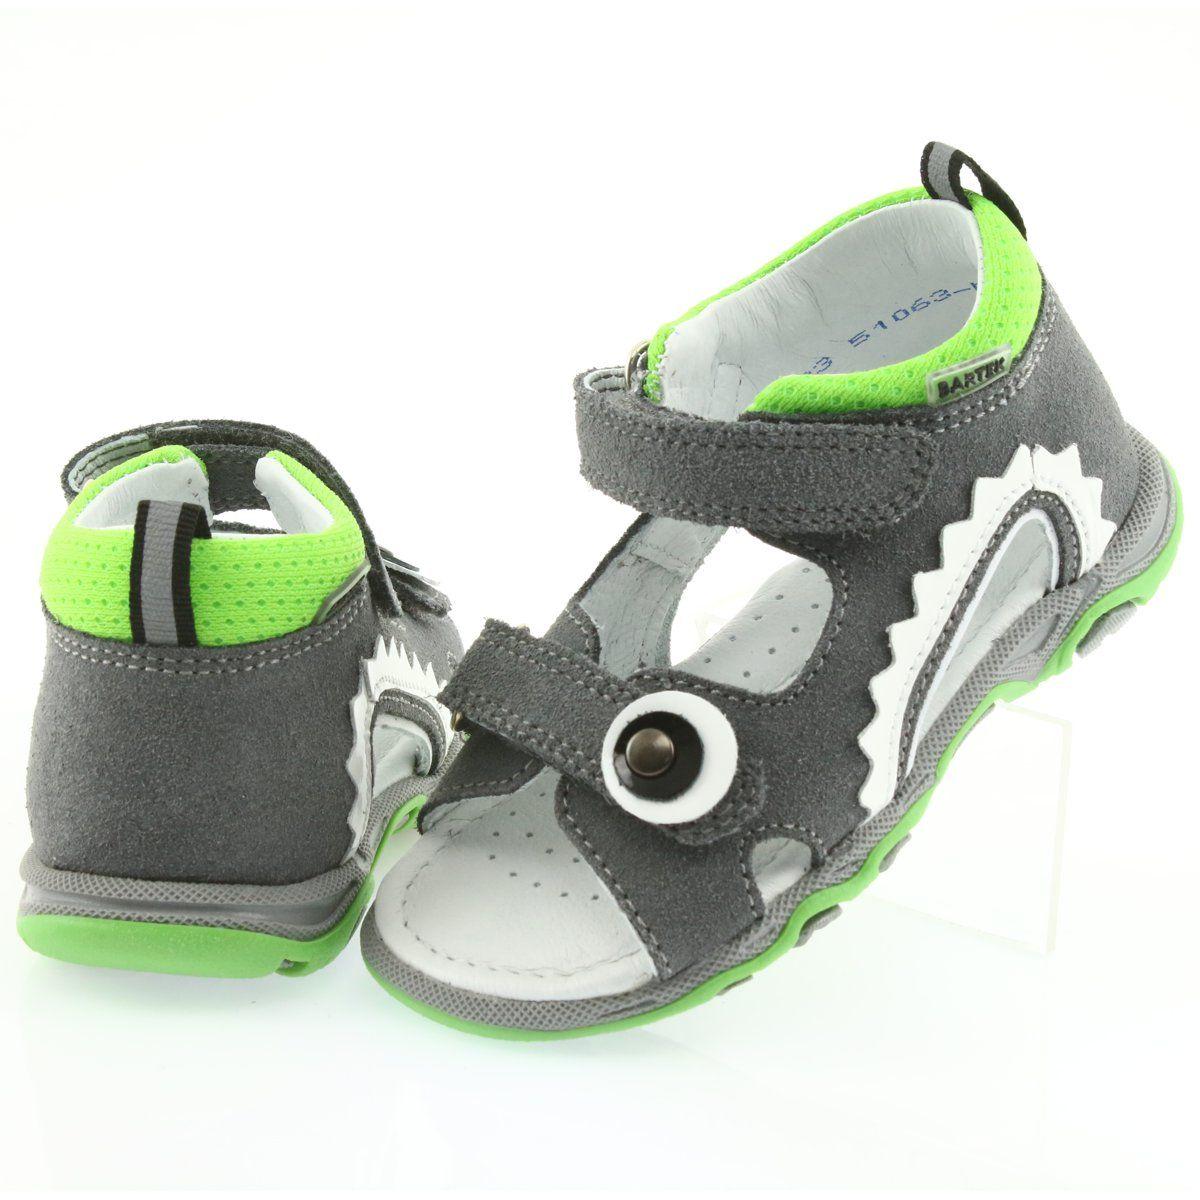 Sandalki Chlopiece Rzepy Bartek 51063 Szare Biale Zielone Childrens Leather Shoes Kid Shoes Grey Sandals